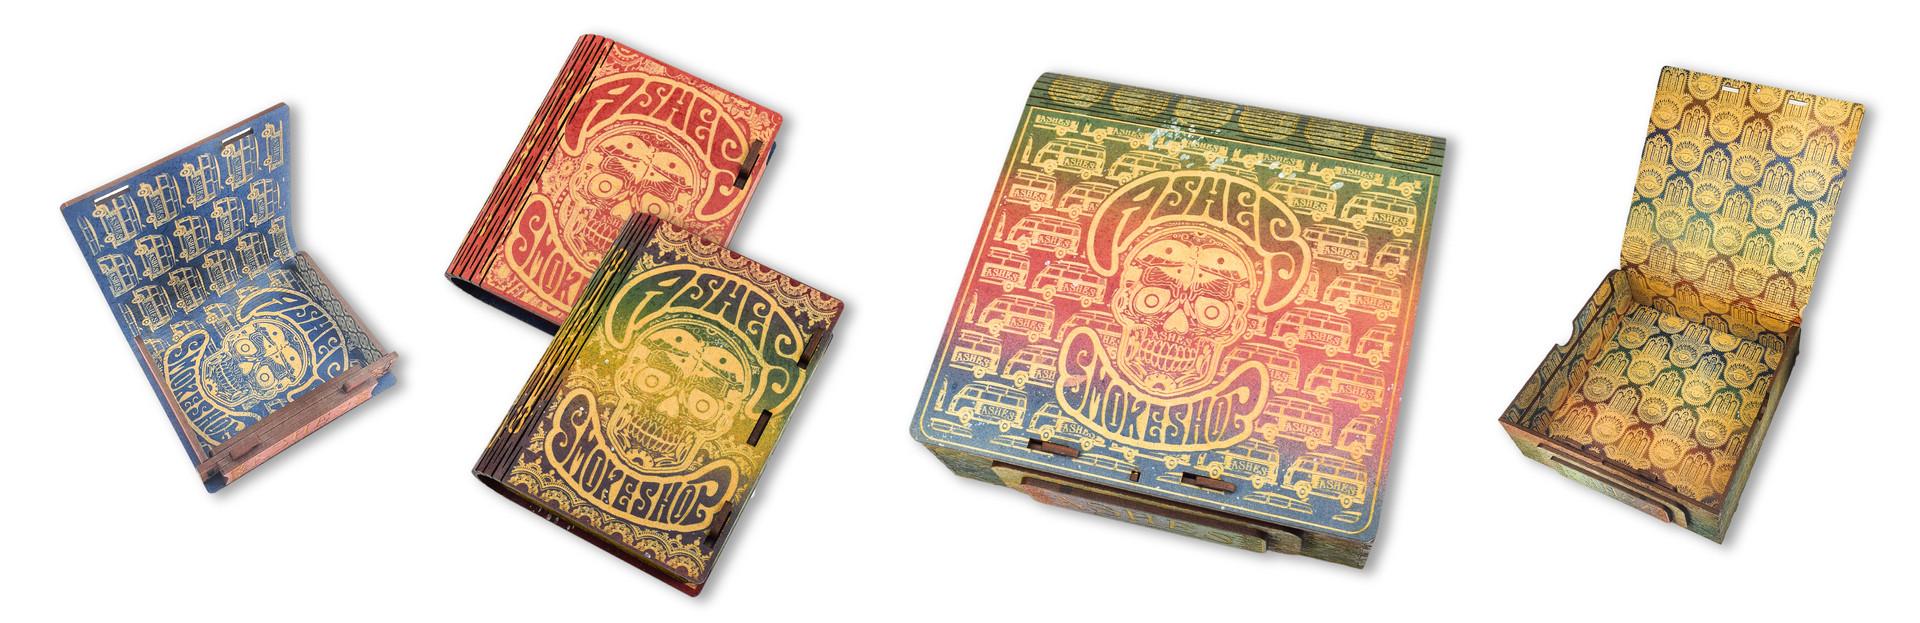 CUSTOM PREMIUM WOOD BOXES | ASHES DENTON